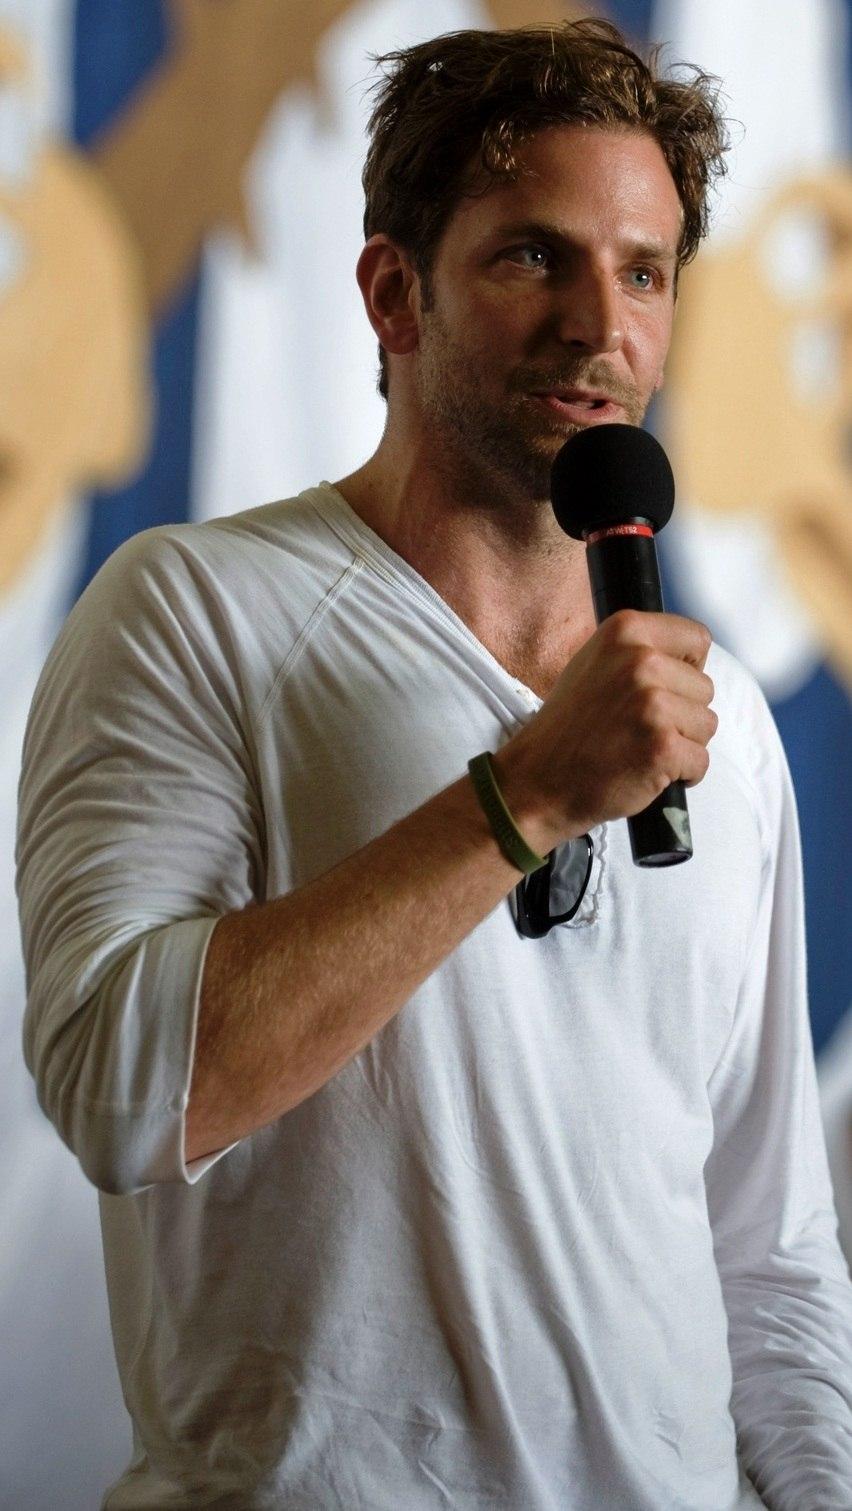 Bradley Cooper, July 2009 (cropped)